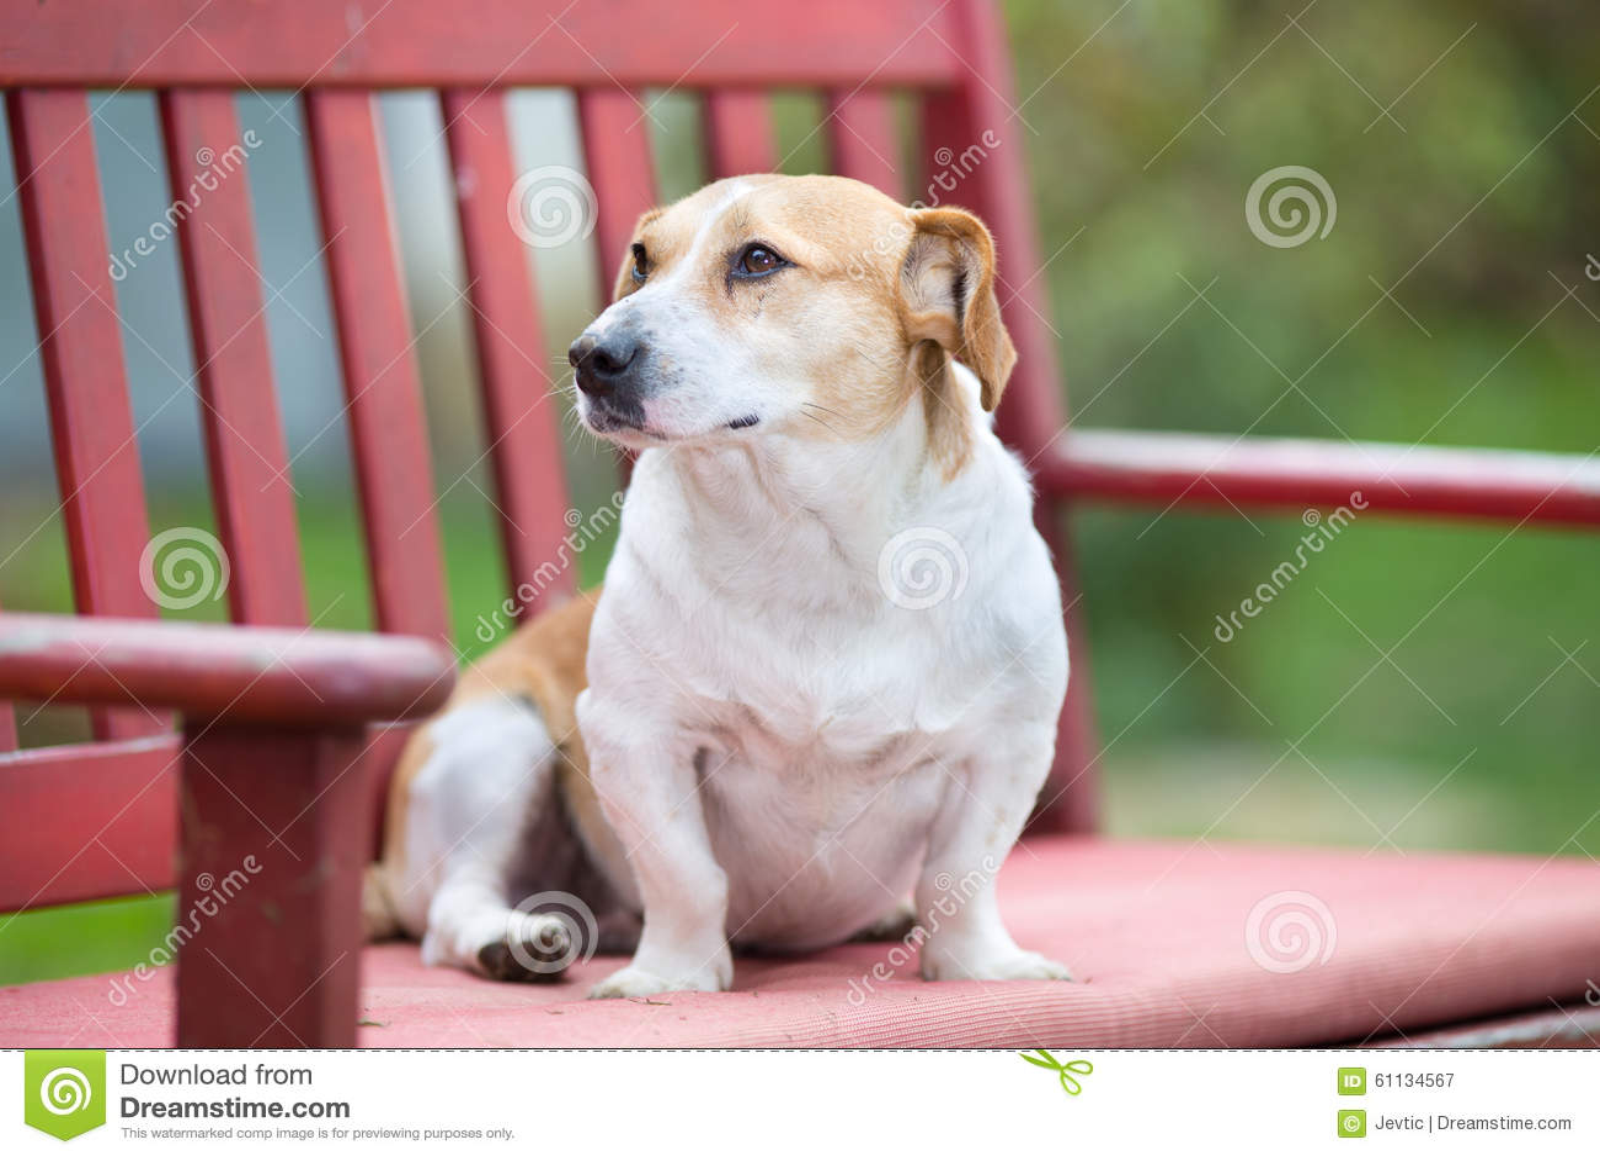 Wondrous Small Dog On The Bench Stock Image Image Of Crooked 61134567 Frankydiablos Diy Chair Ideas Frankydiabloscom